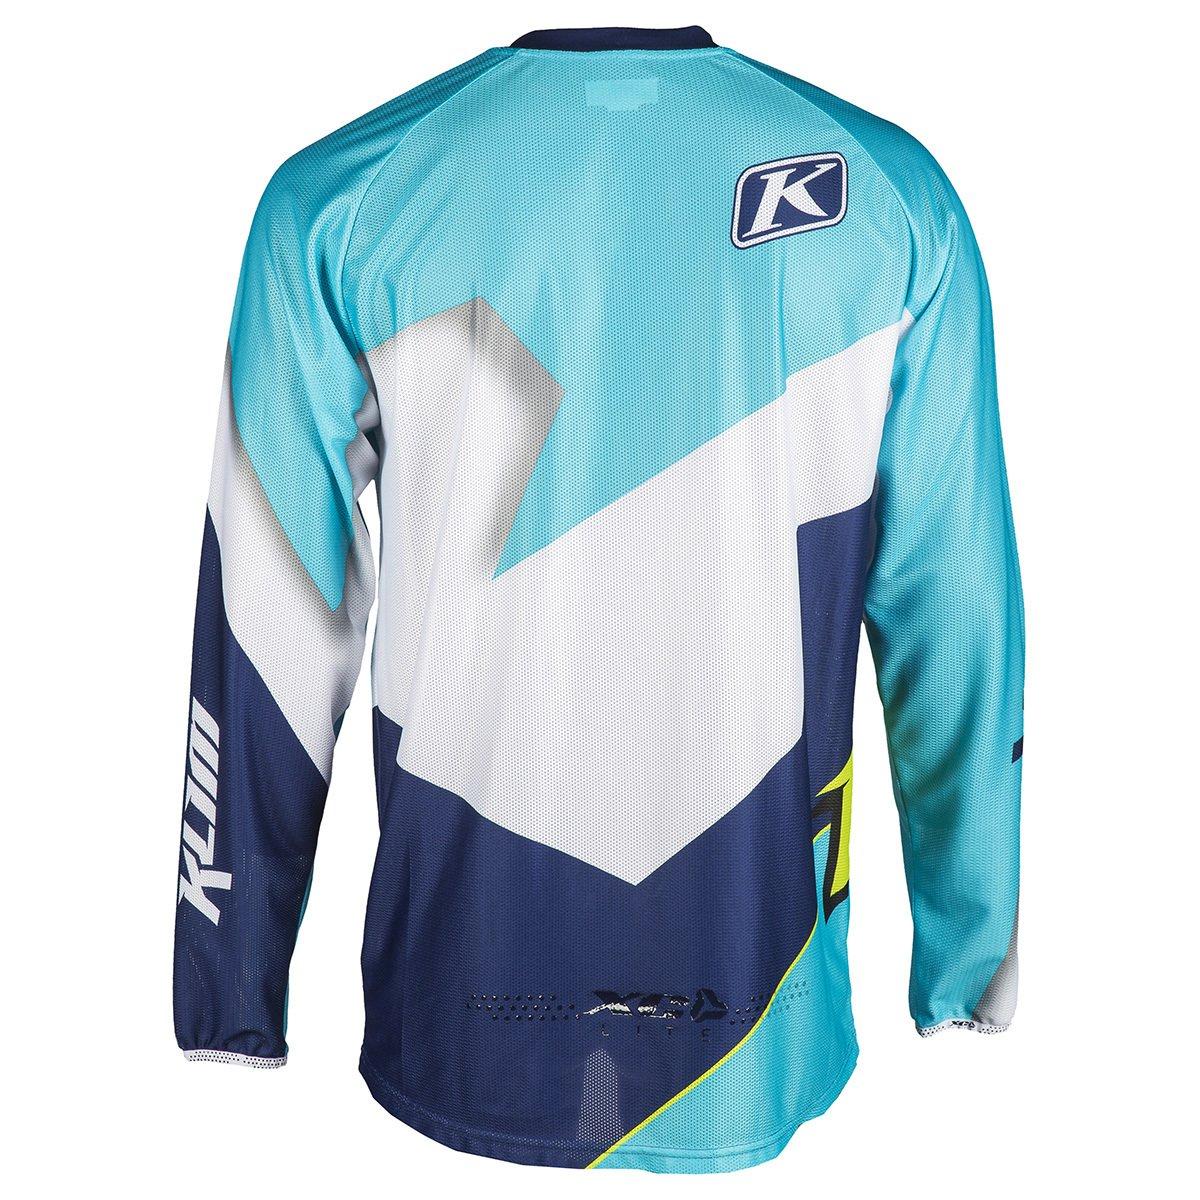 Klim XC Lite Jersey - MD/Blue by Klim (Image #2)